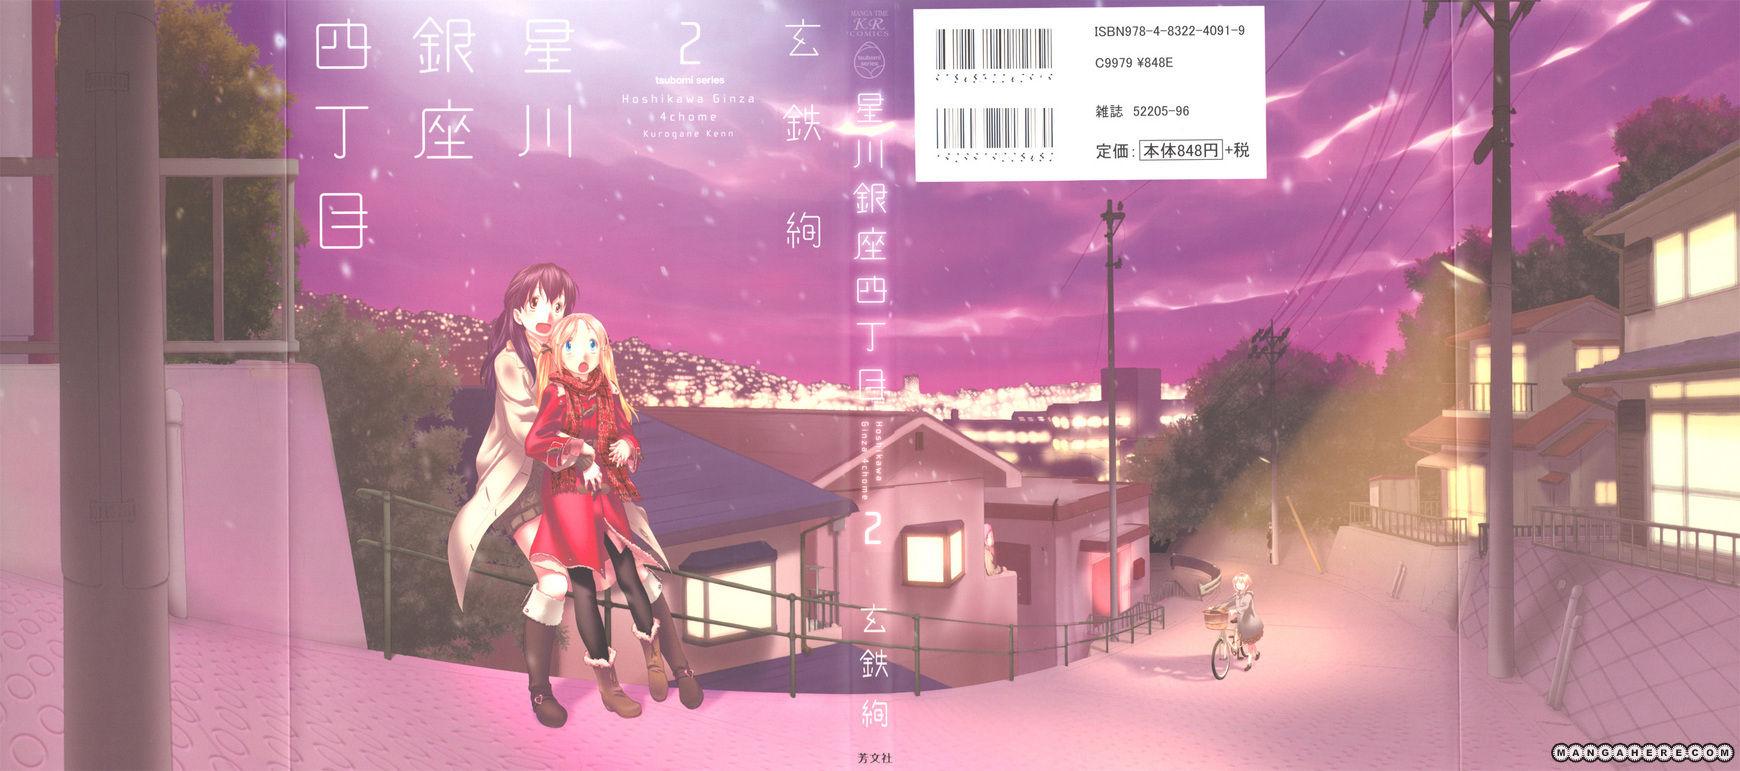 Hoshikawa Ginza Yonchoume 13 Page 1